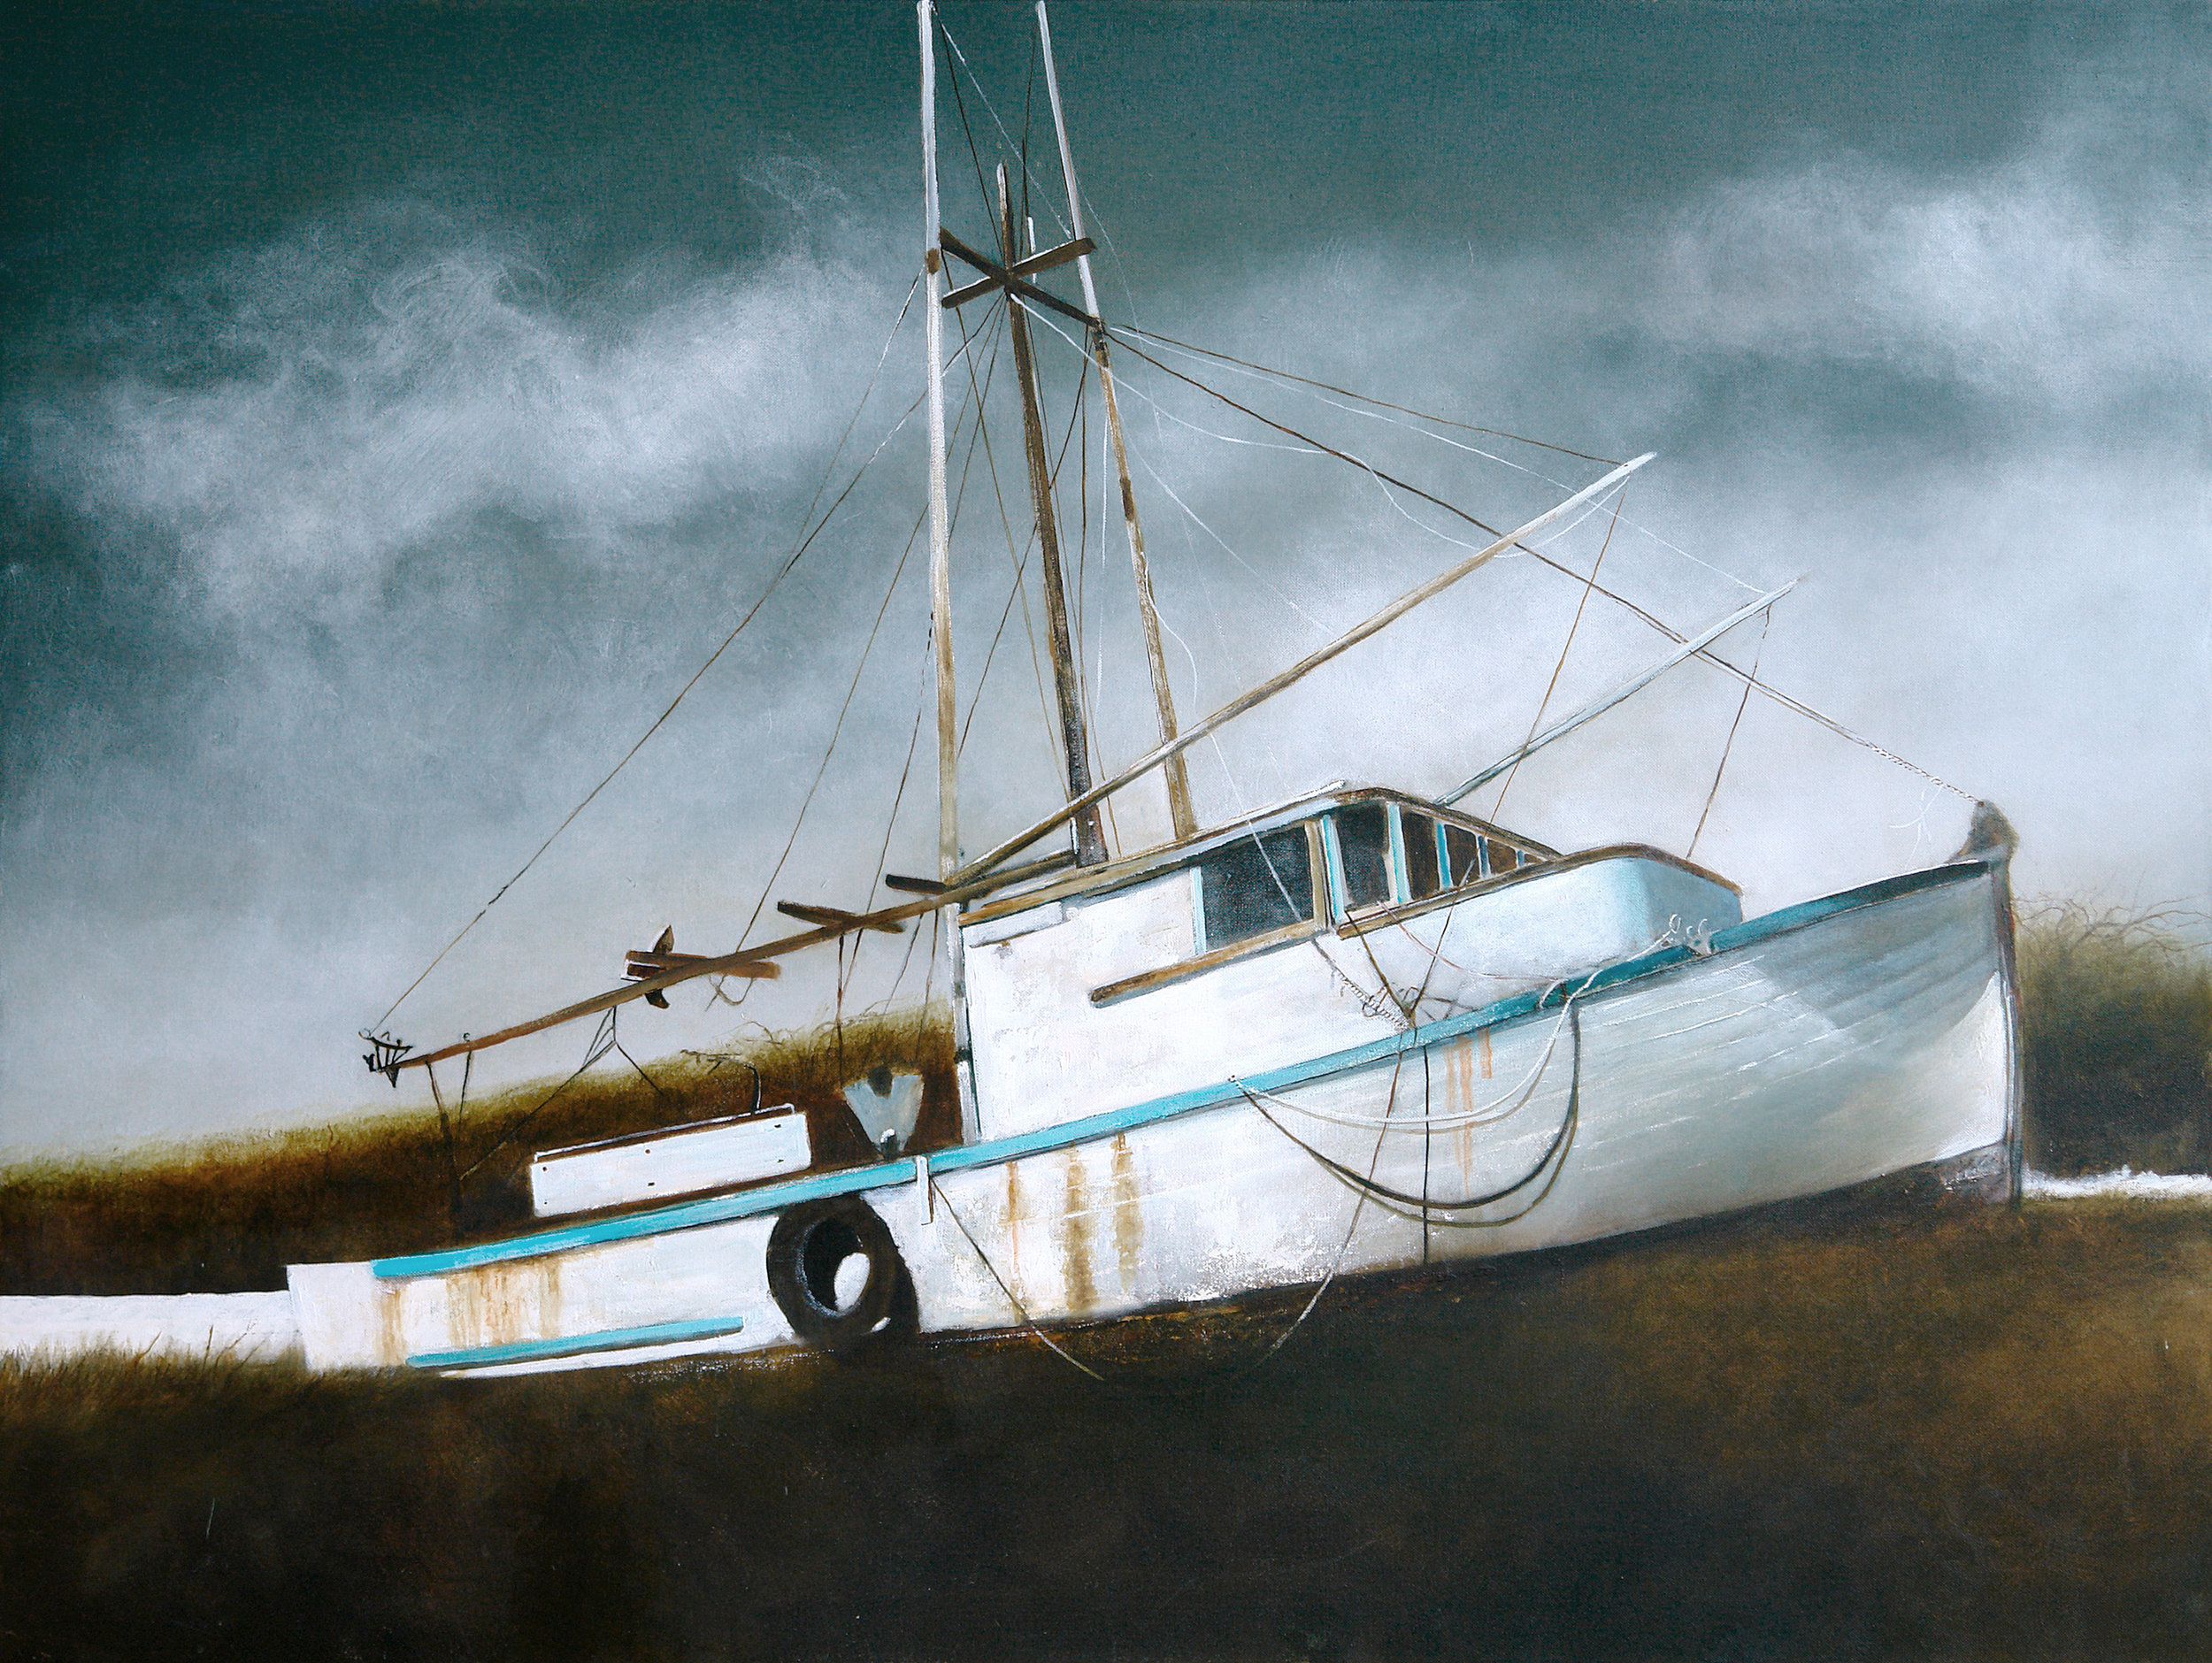 boatinfield.jpg